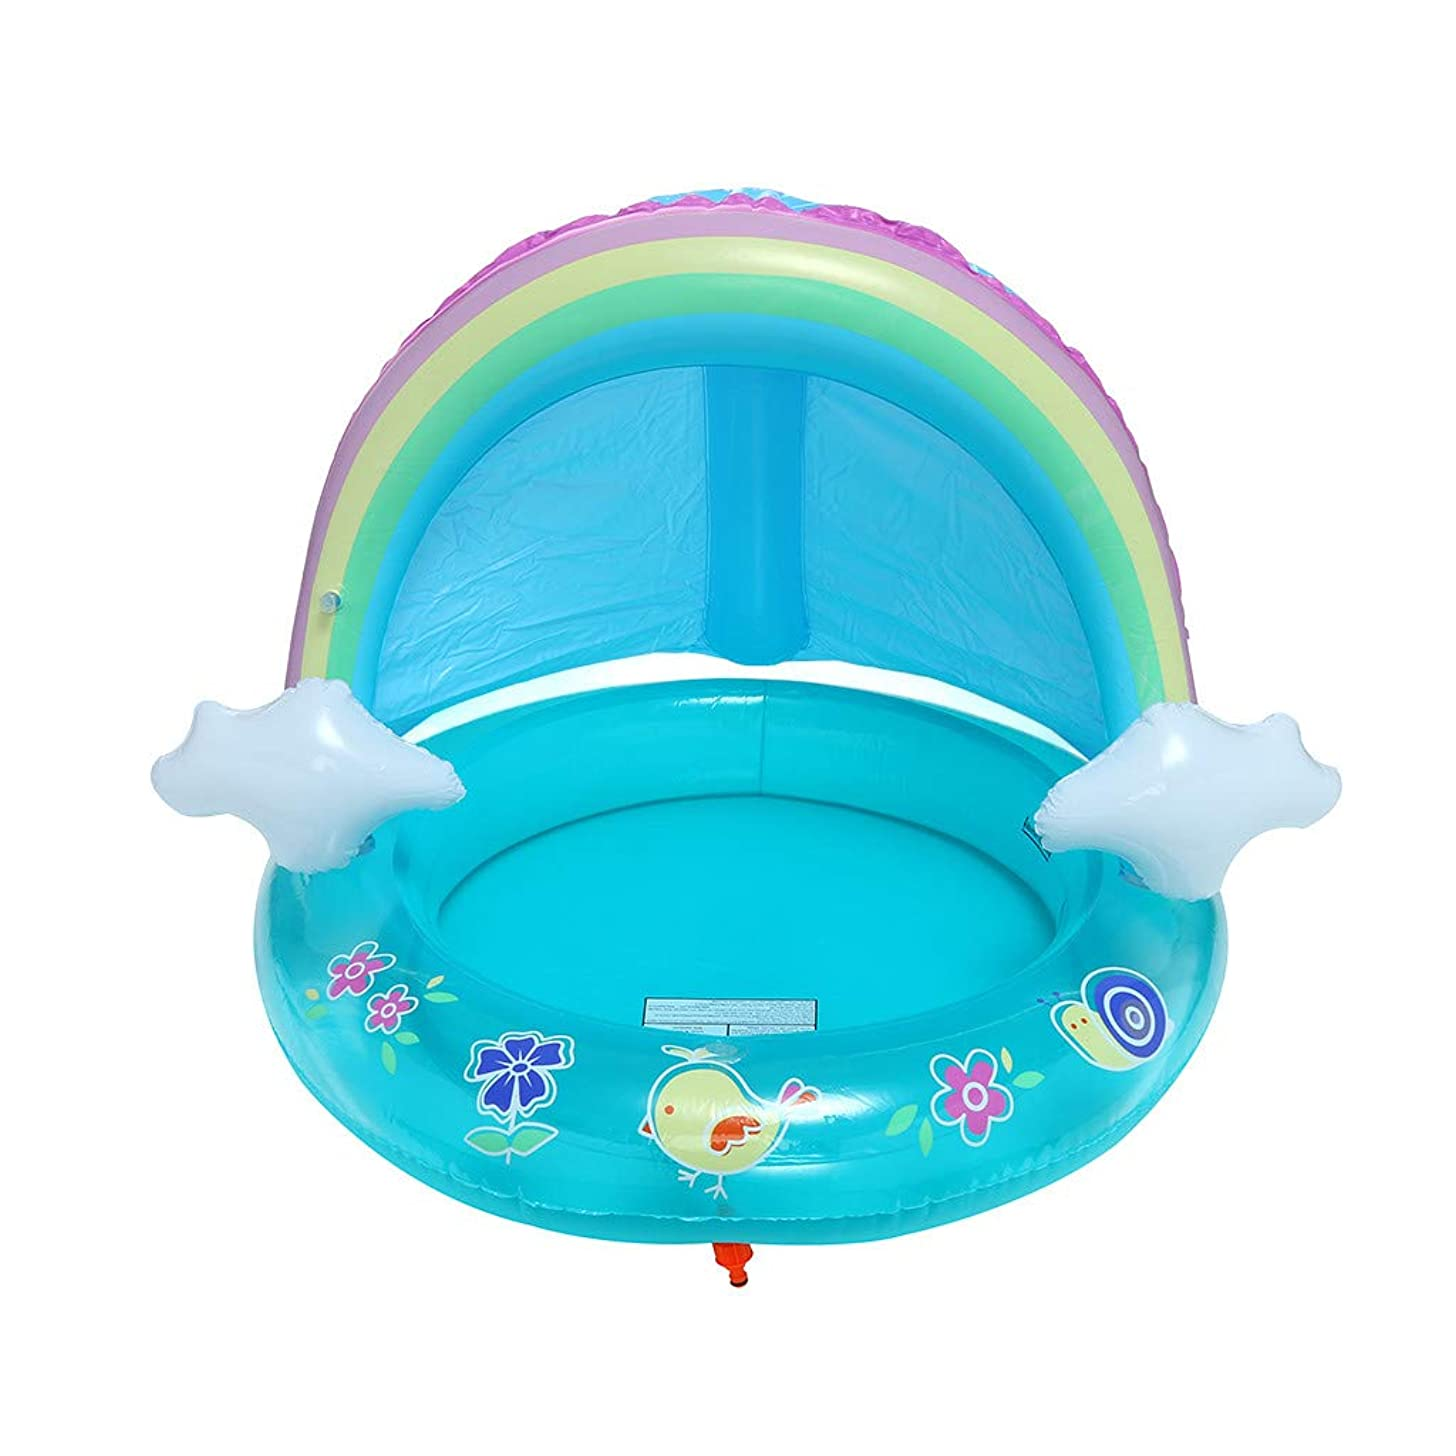 Jiayit US Fast Shipment Rainbow Children's Spray Ring Baby Pool, Rainbow Splash Pool with Canopy, Spray Pool of 40In, Water Sprinkler